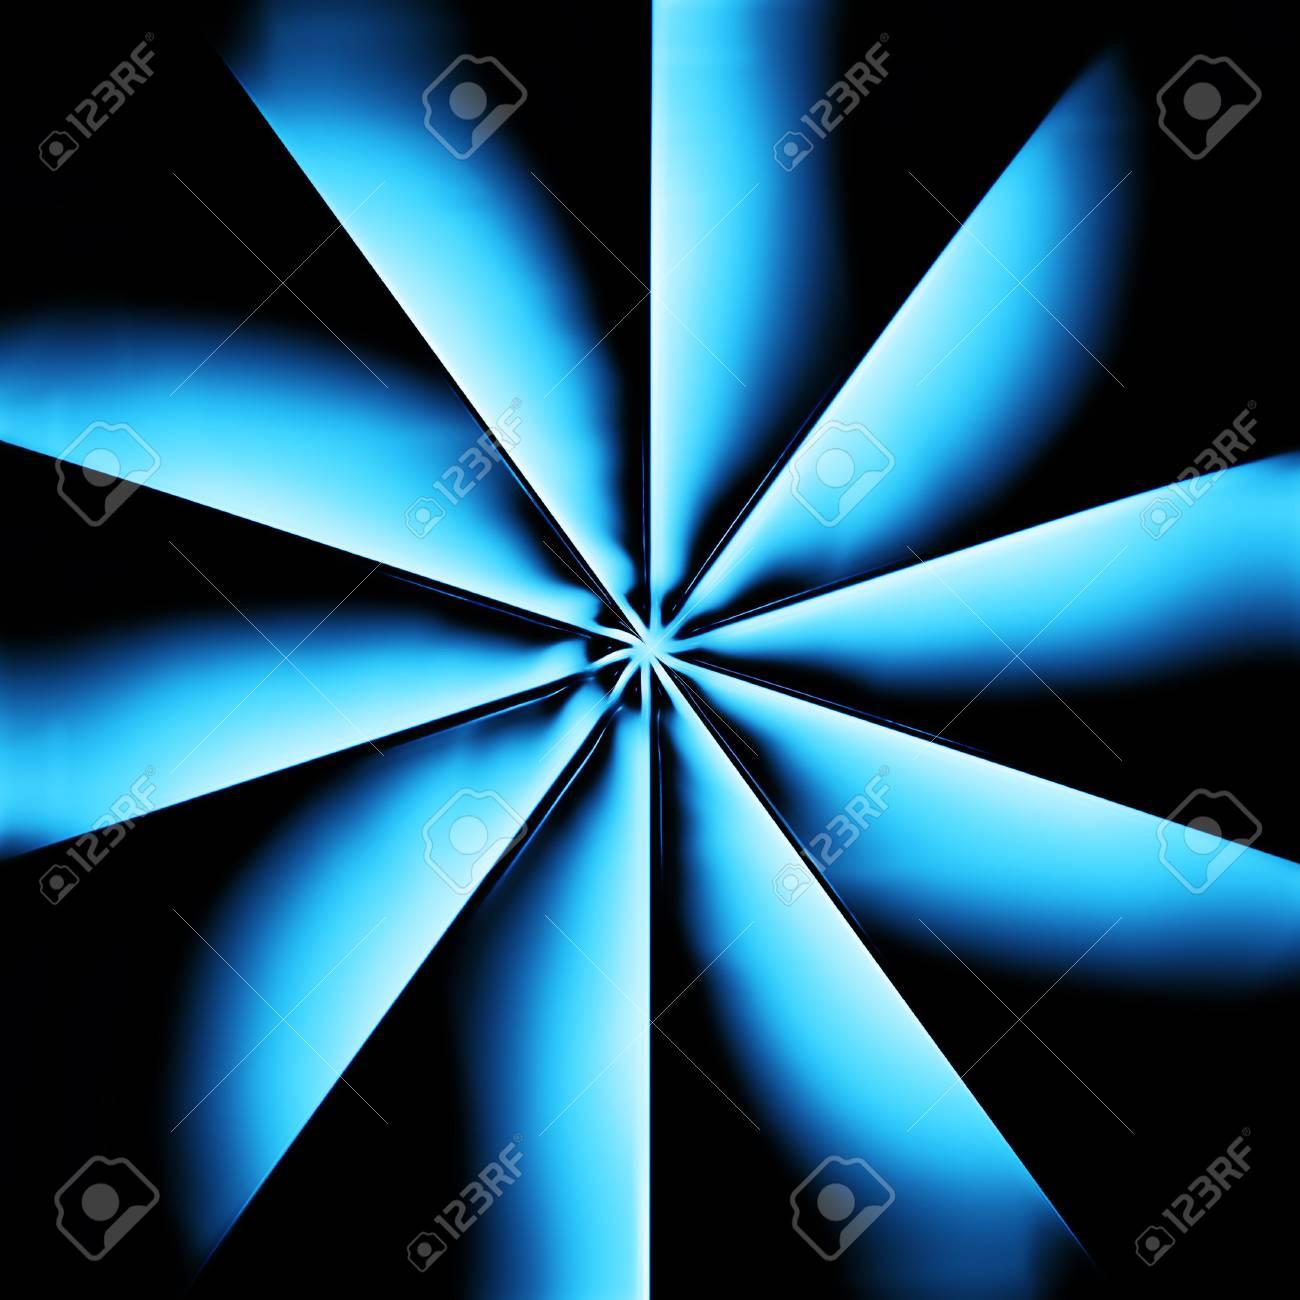 A blue radiator on dark background Stock Photo - 5449369